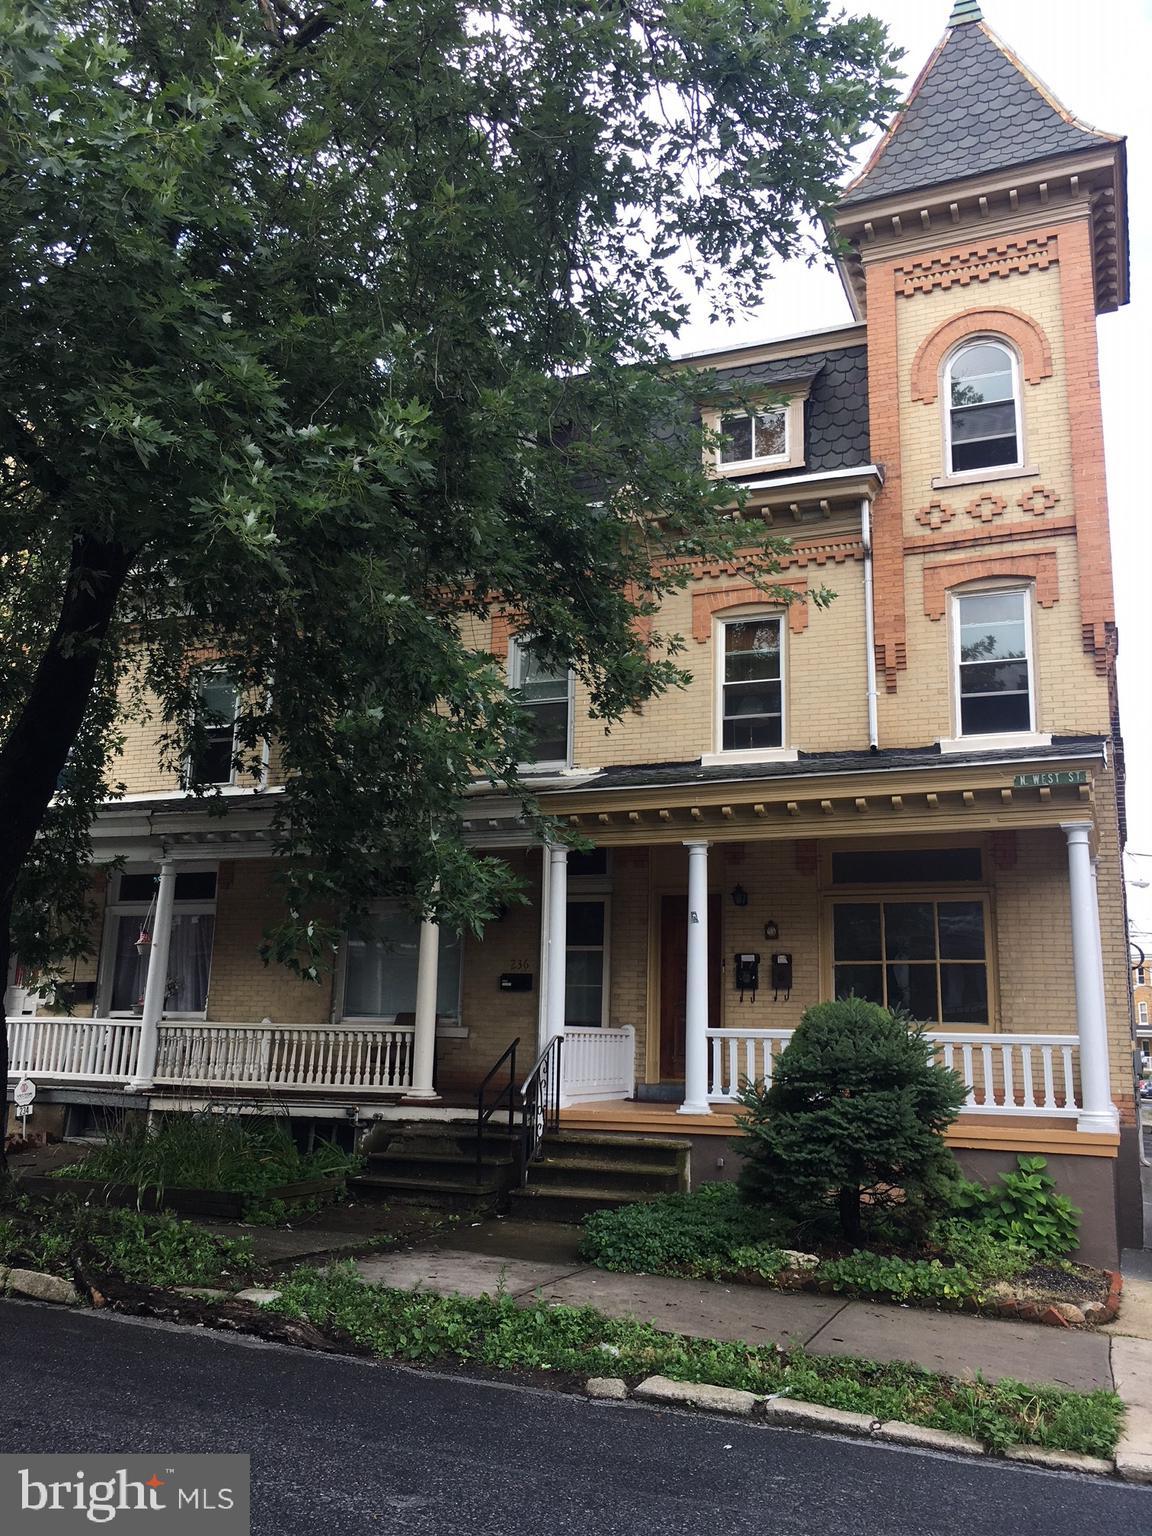 238 WEST STREET N, ALLENTOWN, PA 18102